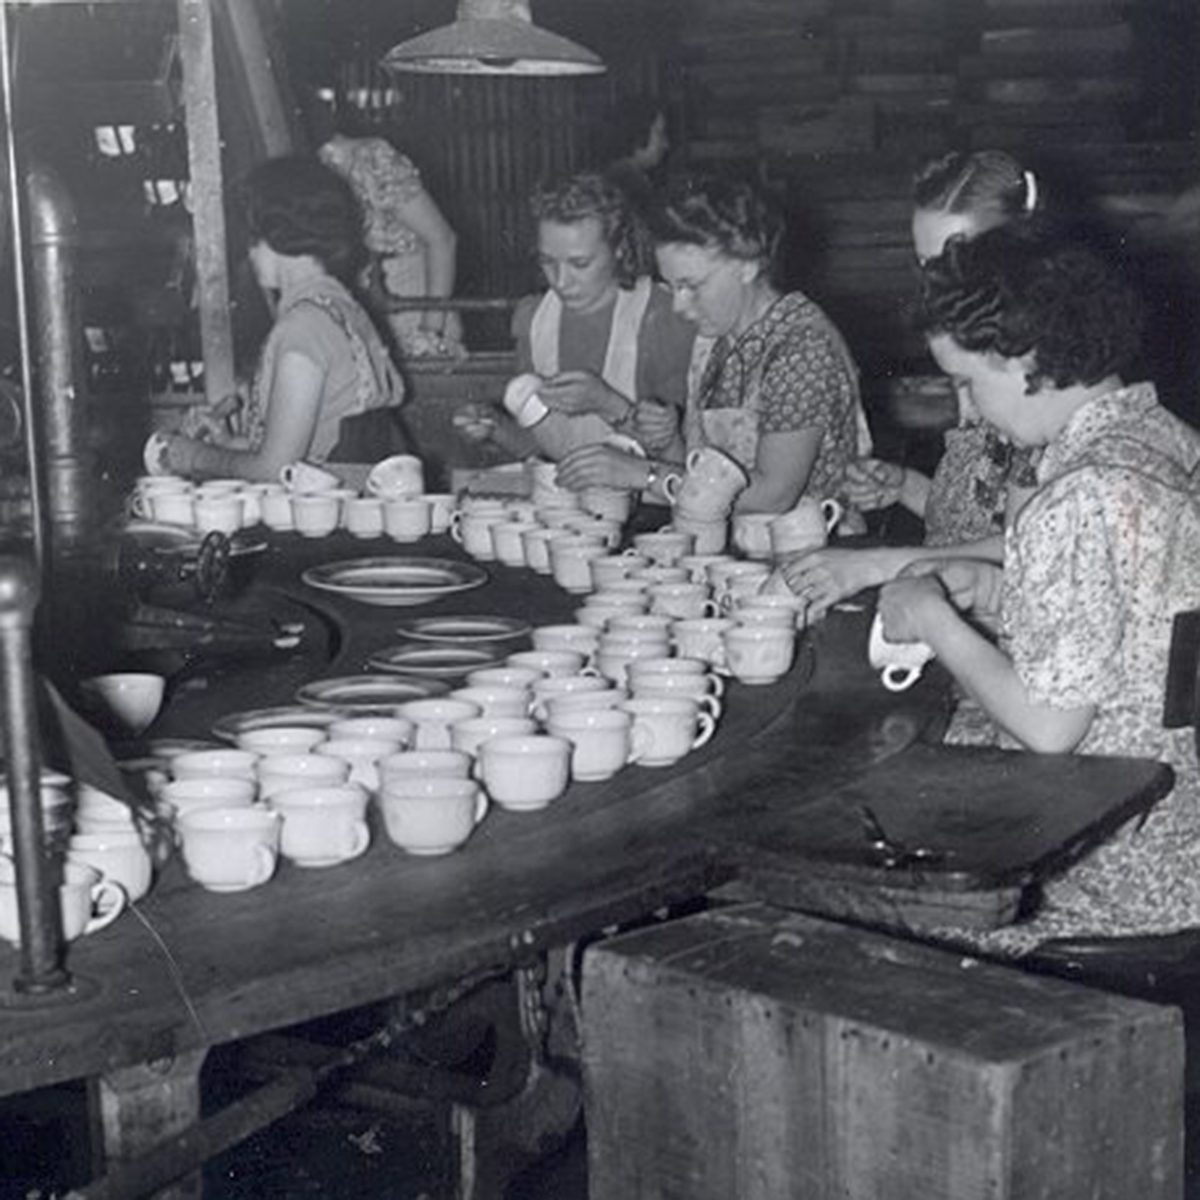 Fiesta Dinnerware factory